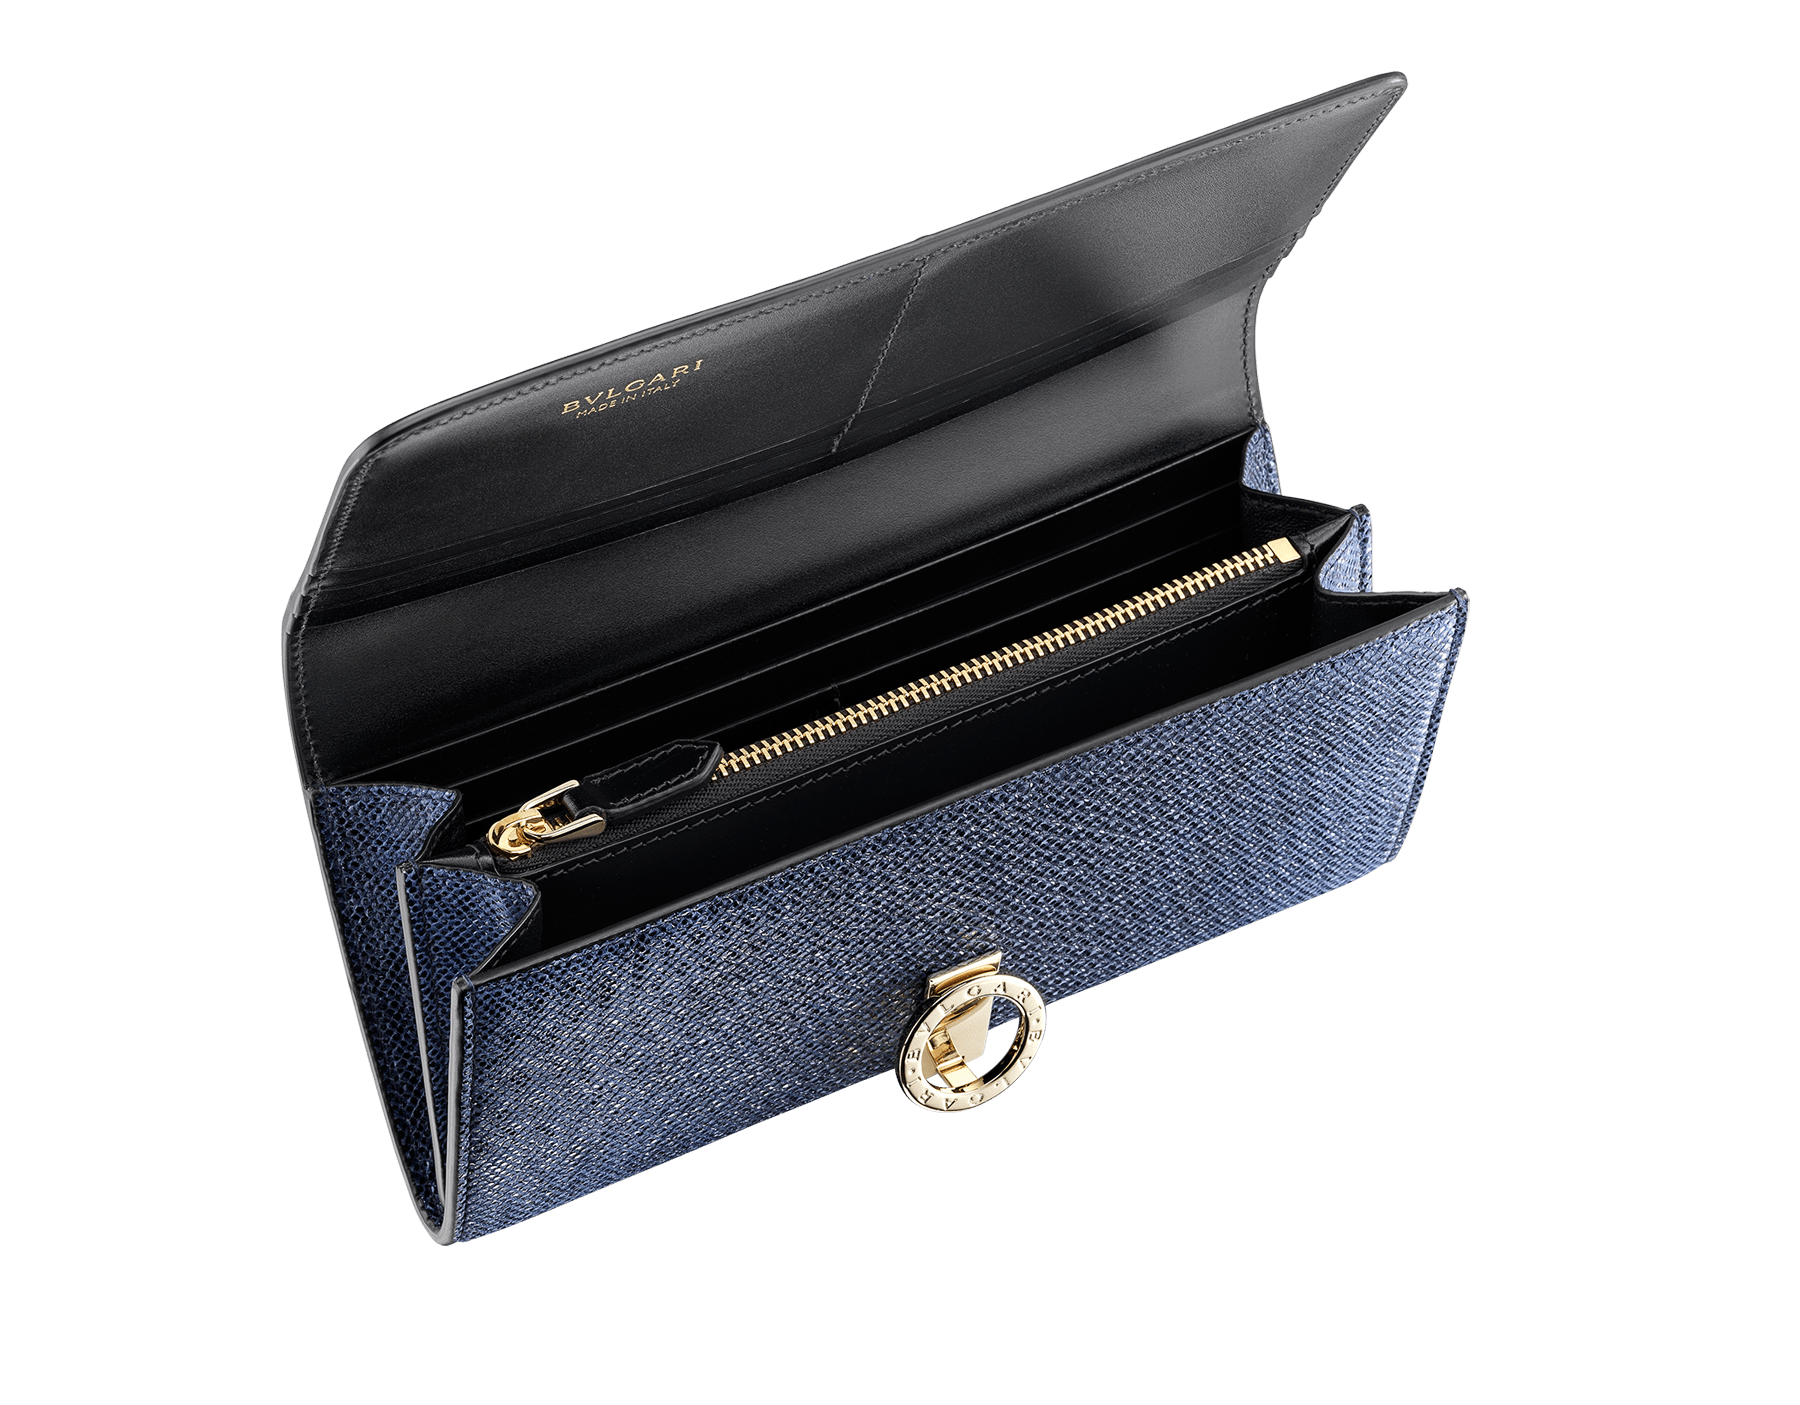 """BVLGARI BVLGARI"" large wallet in metallic Midnight Sapphire blue karung skin and black calfskin. Iconiclogo clip closure in light gold plated brass. 579-WLT-SLI-POC-CL-MK image 2"